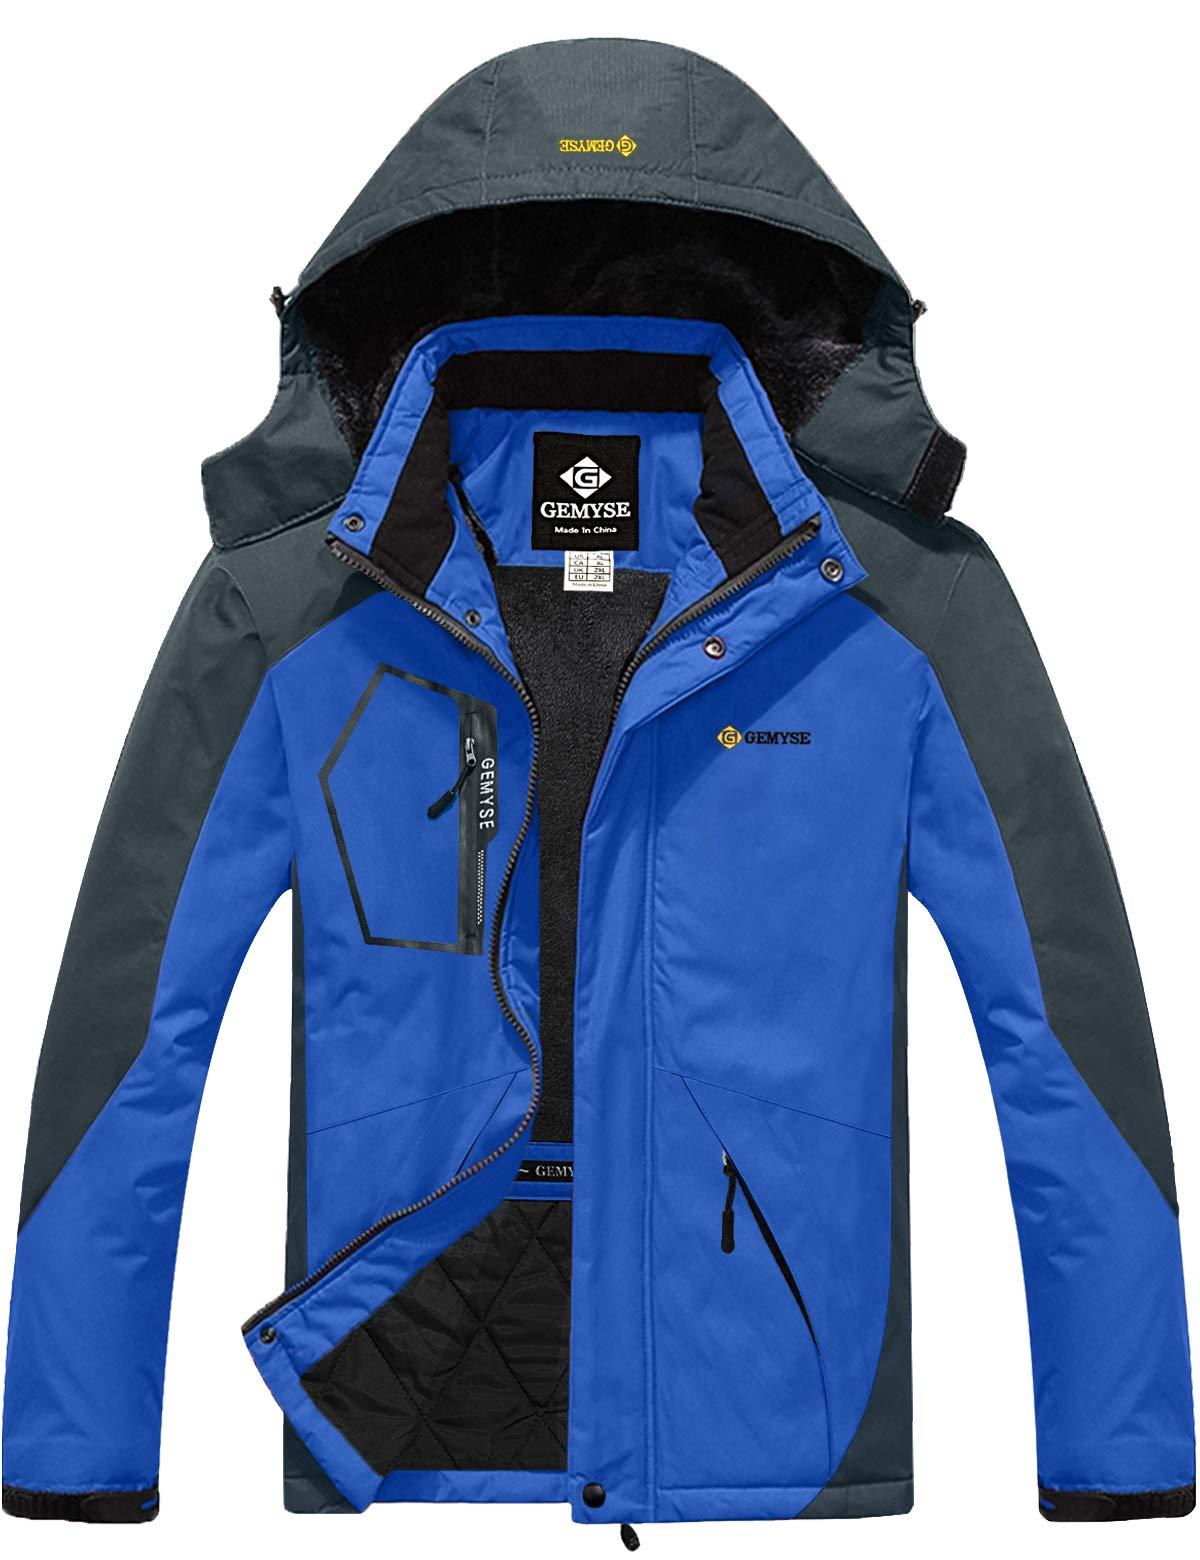 GEMYSE Men's Mountain Waterproof Ski Snow Jacket Winter Windproof Rain Jacket (Sky Blue,M) by GEMYSE